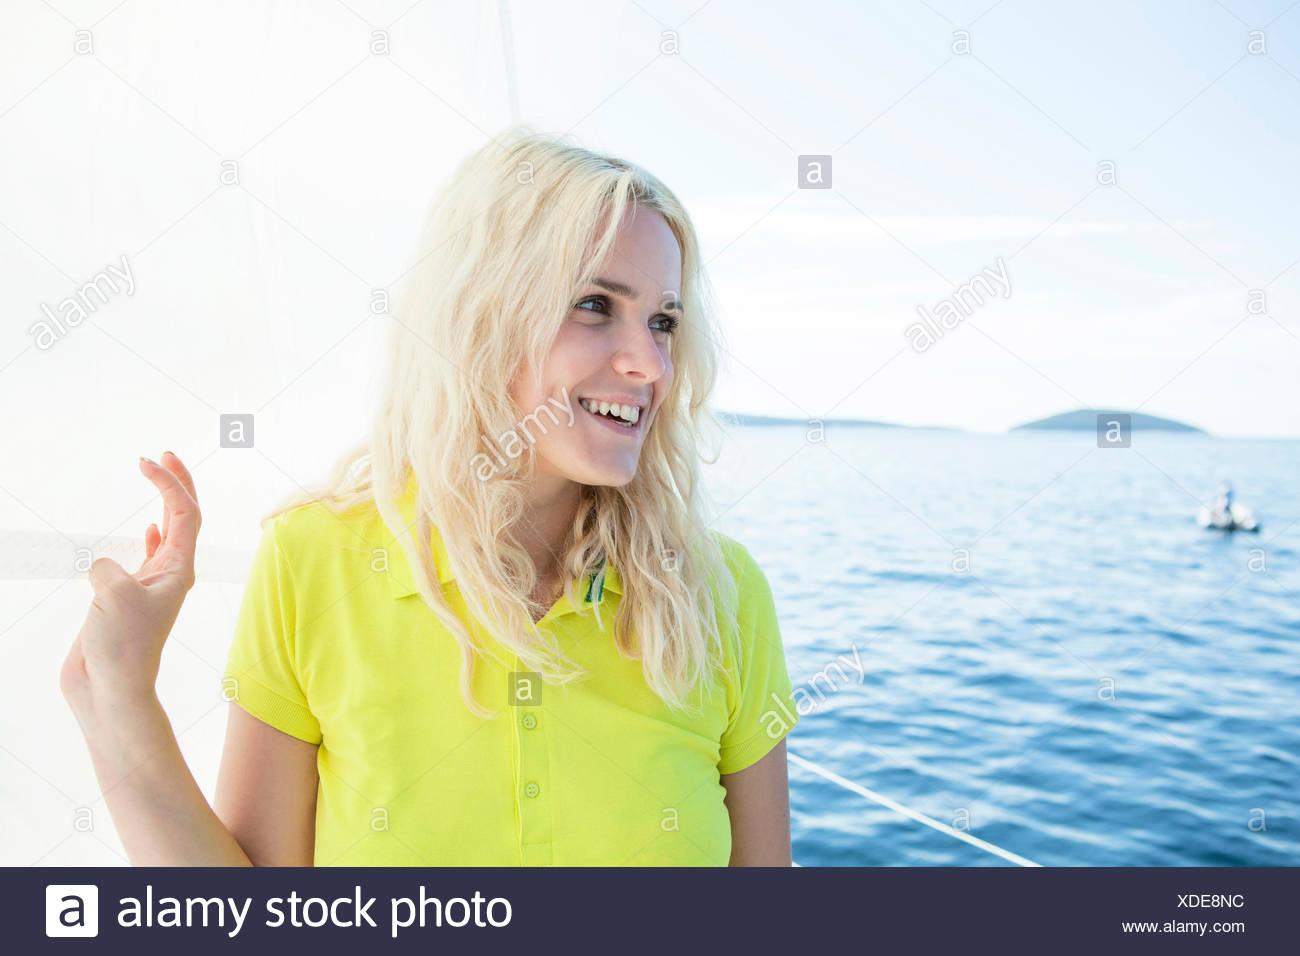 Portrait of woman on sailboat, Adriatic Sea - Stock Image